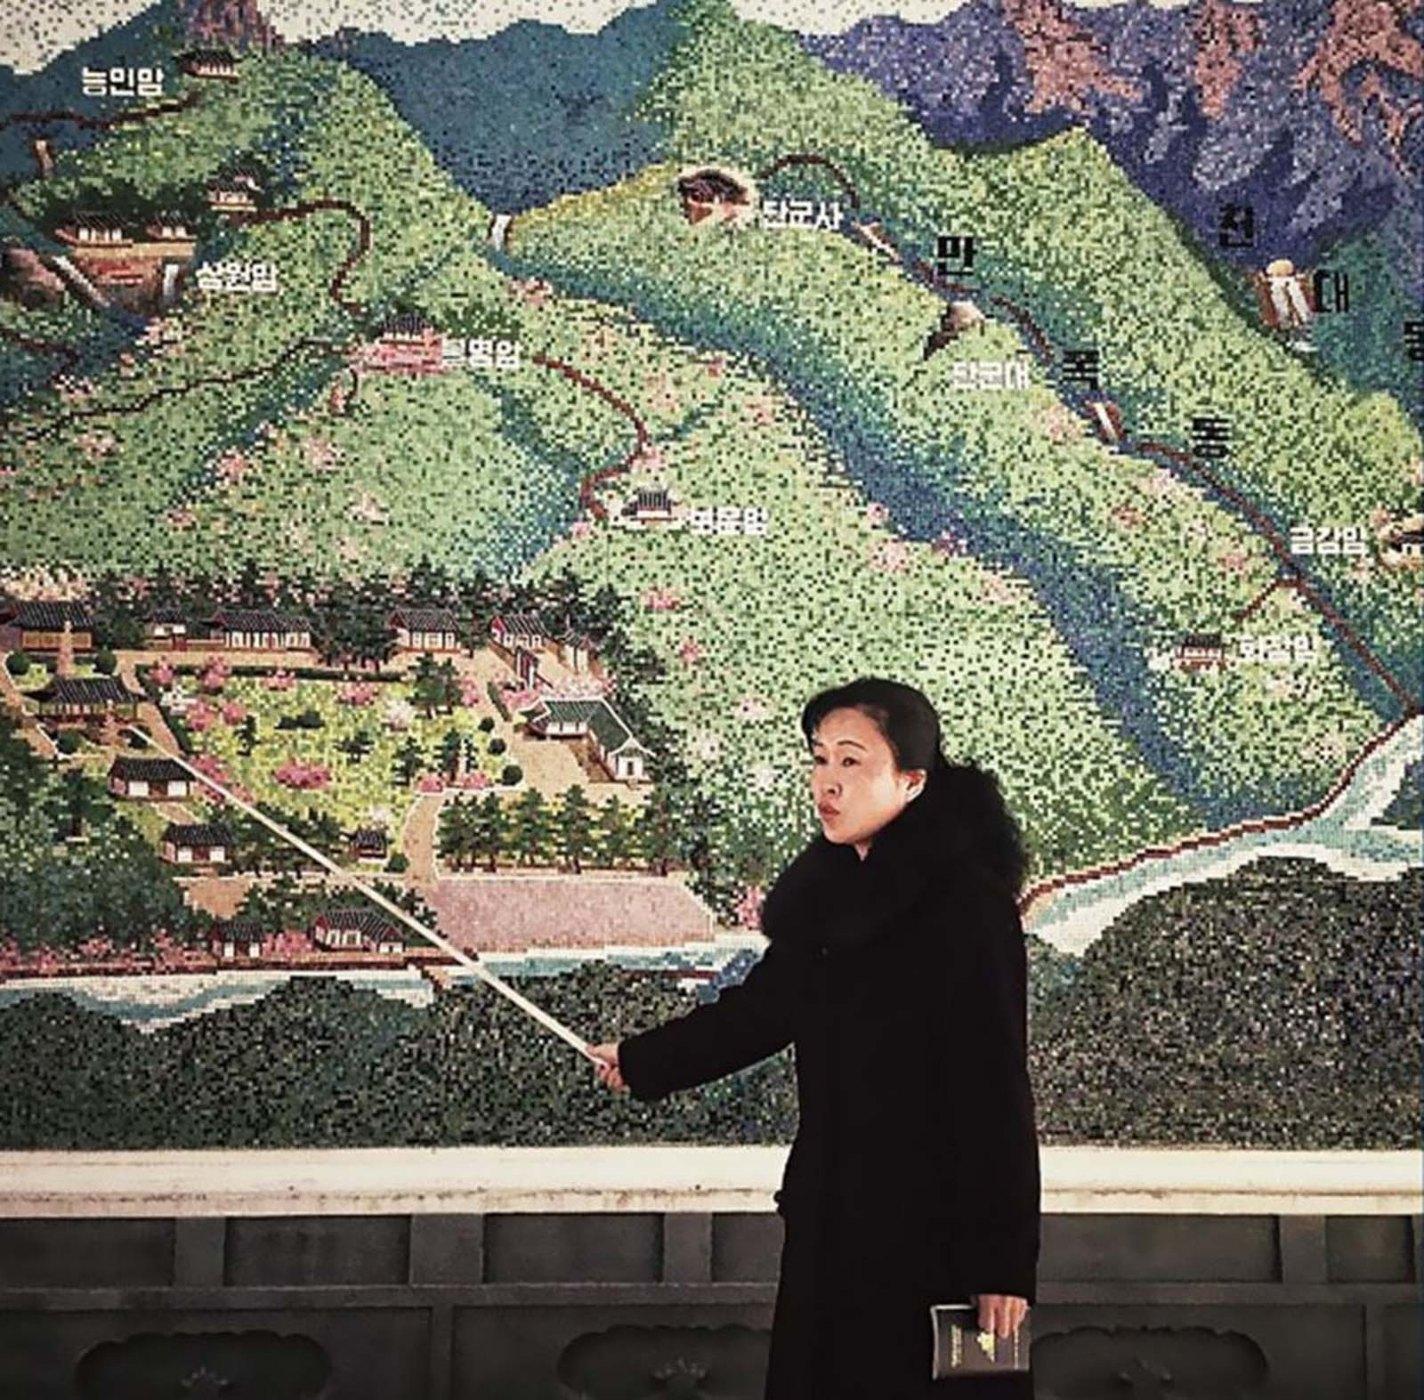 historical photos of North Korea, David Guttenfelder, 2013